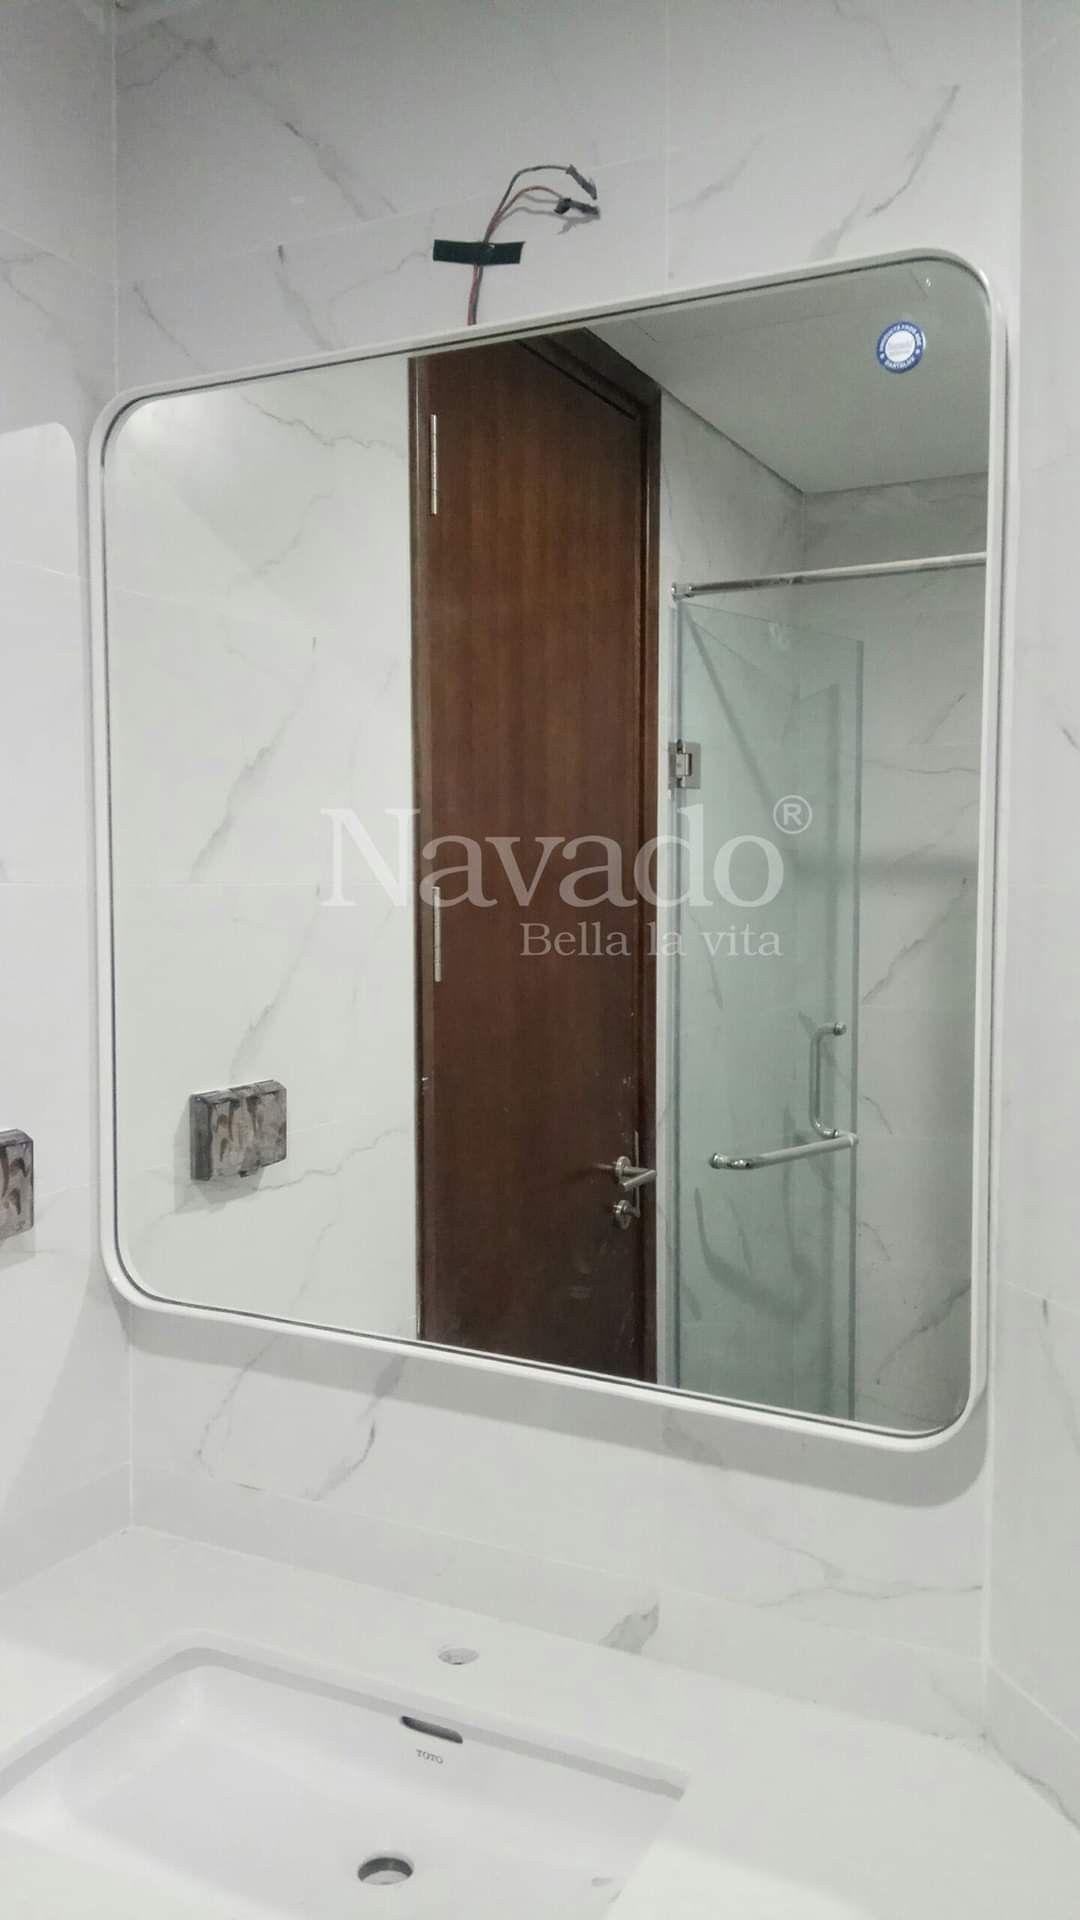 Bathroom mirror white steel frame